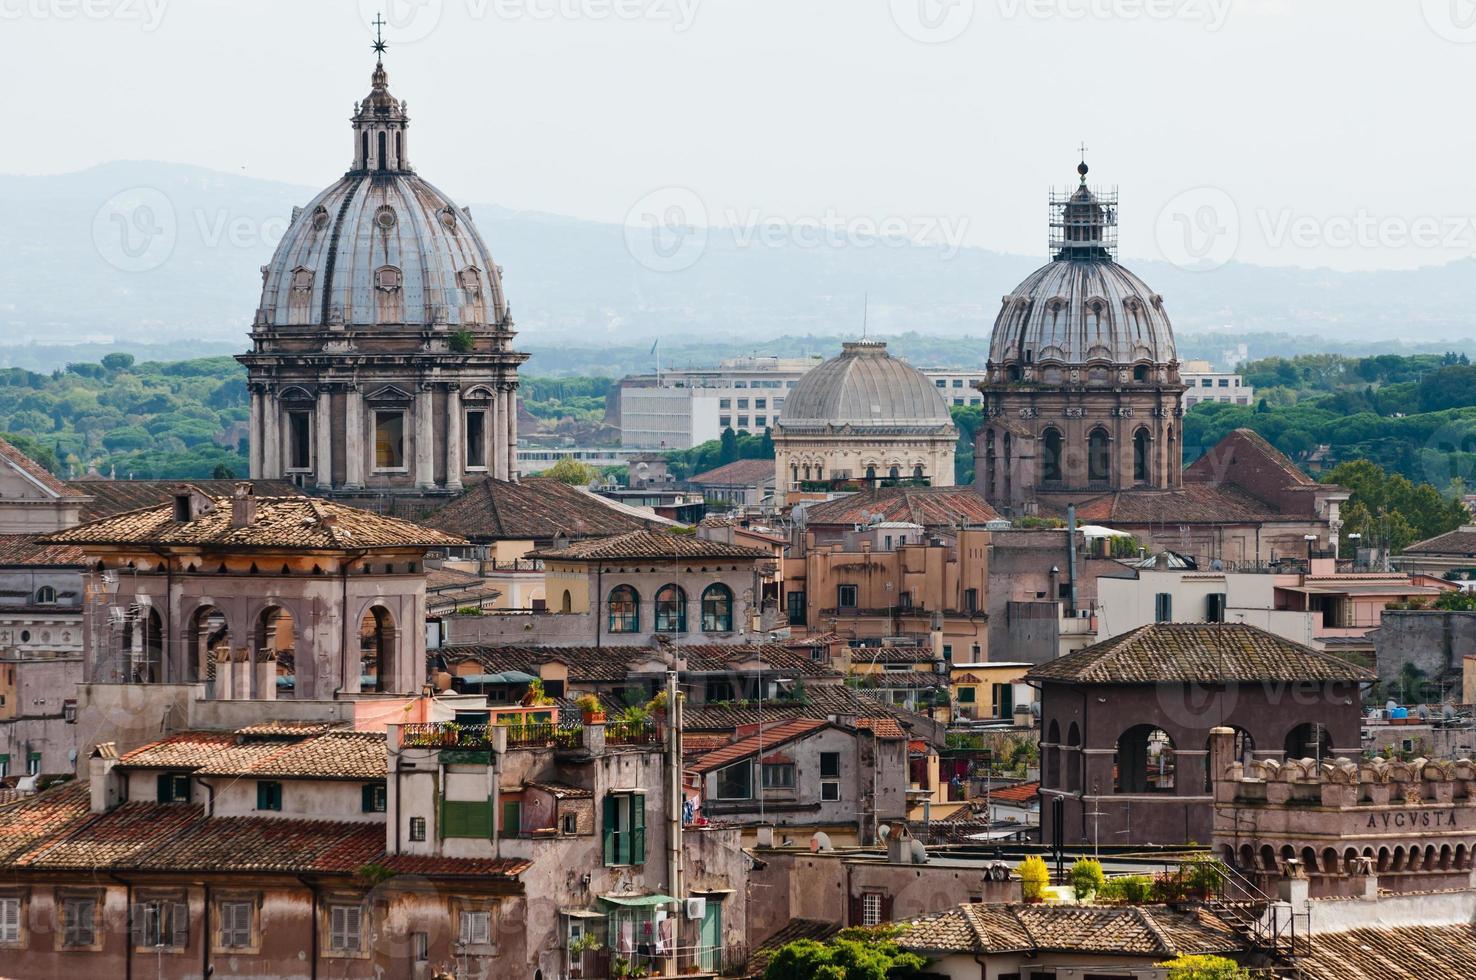 Rome photo